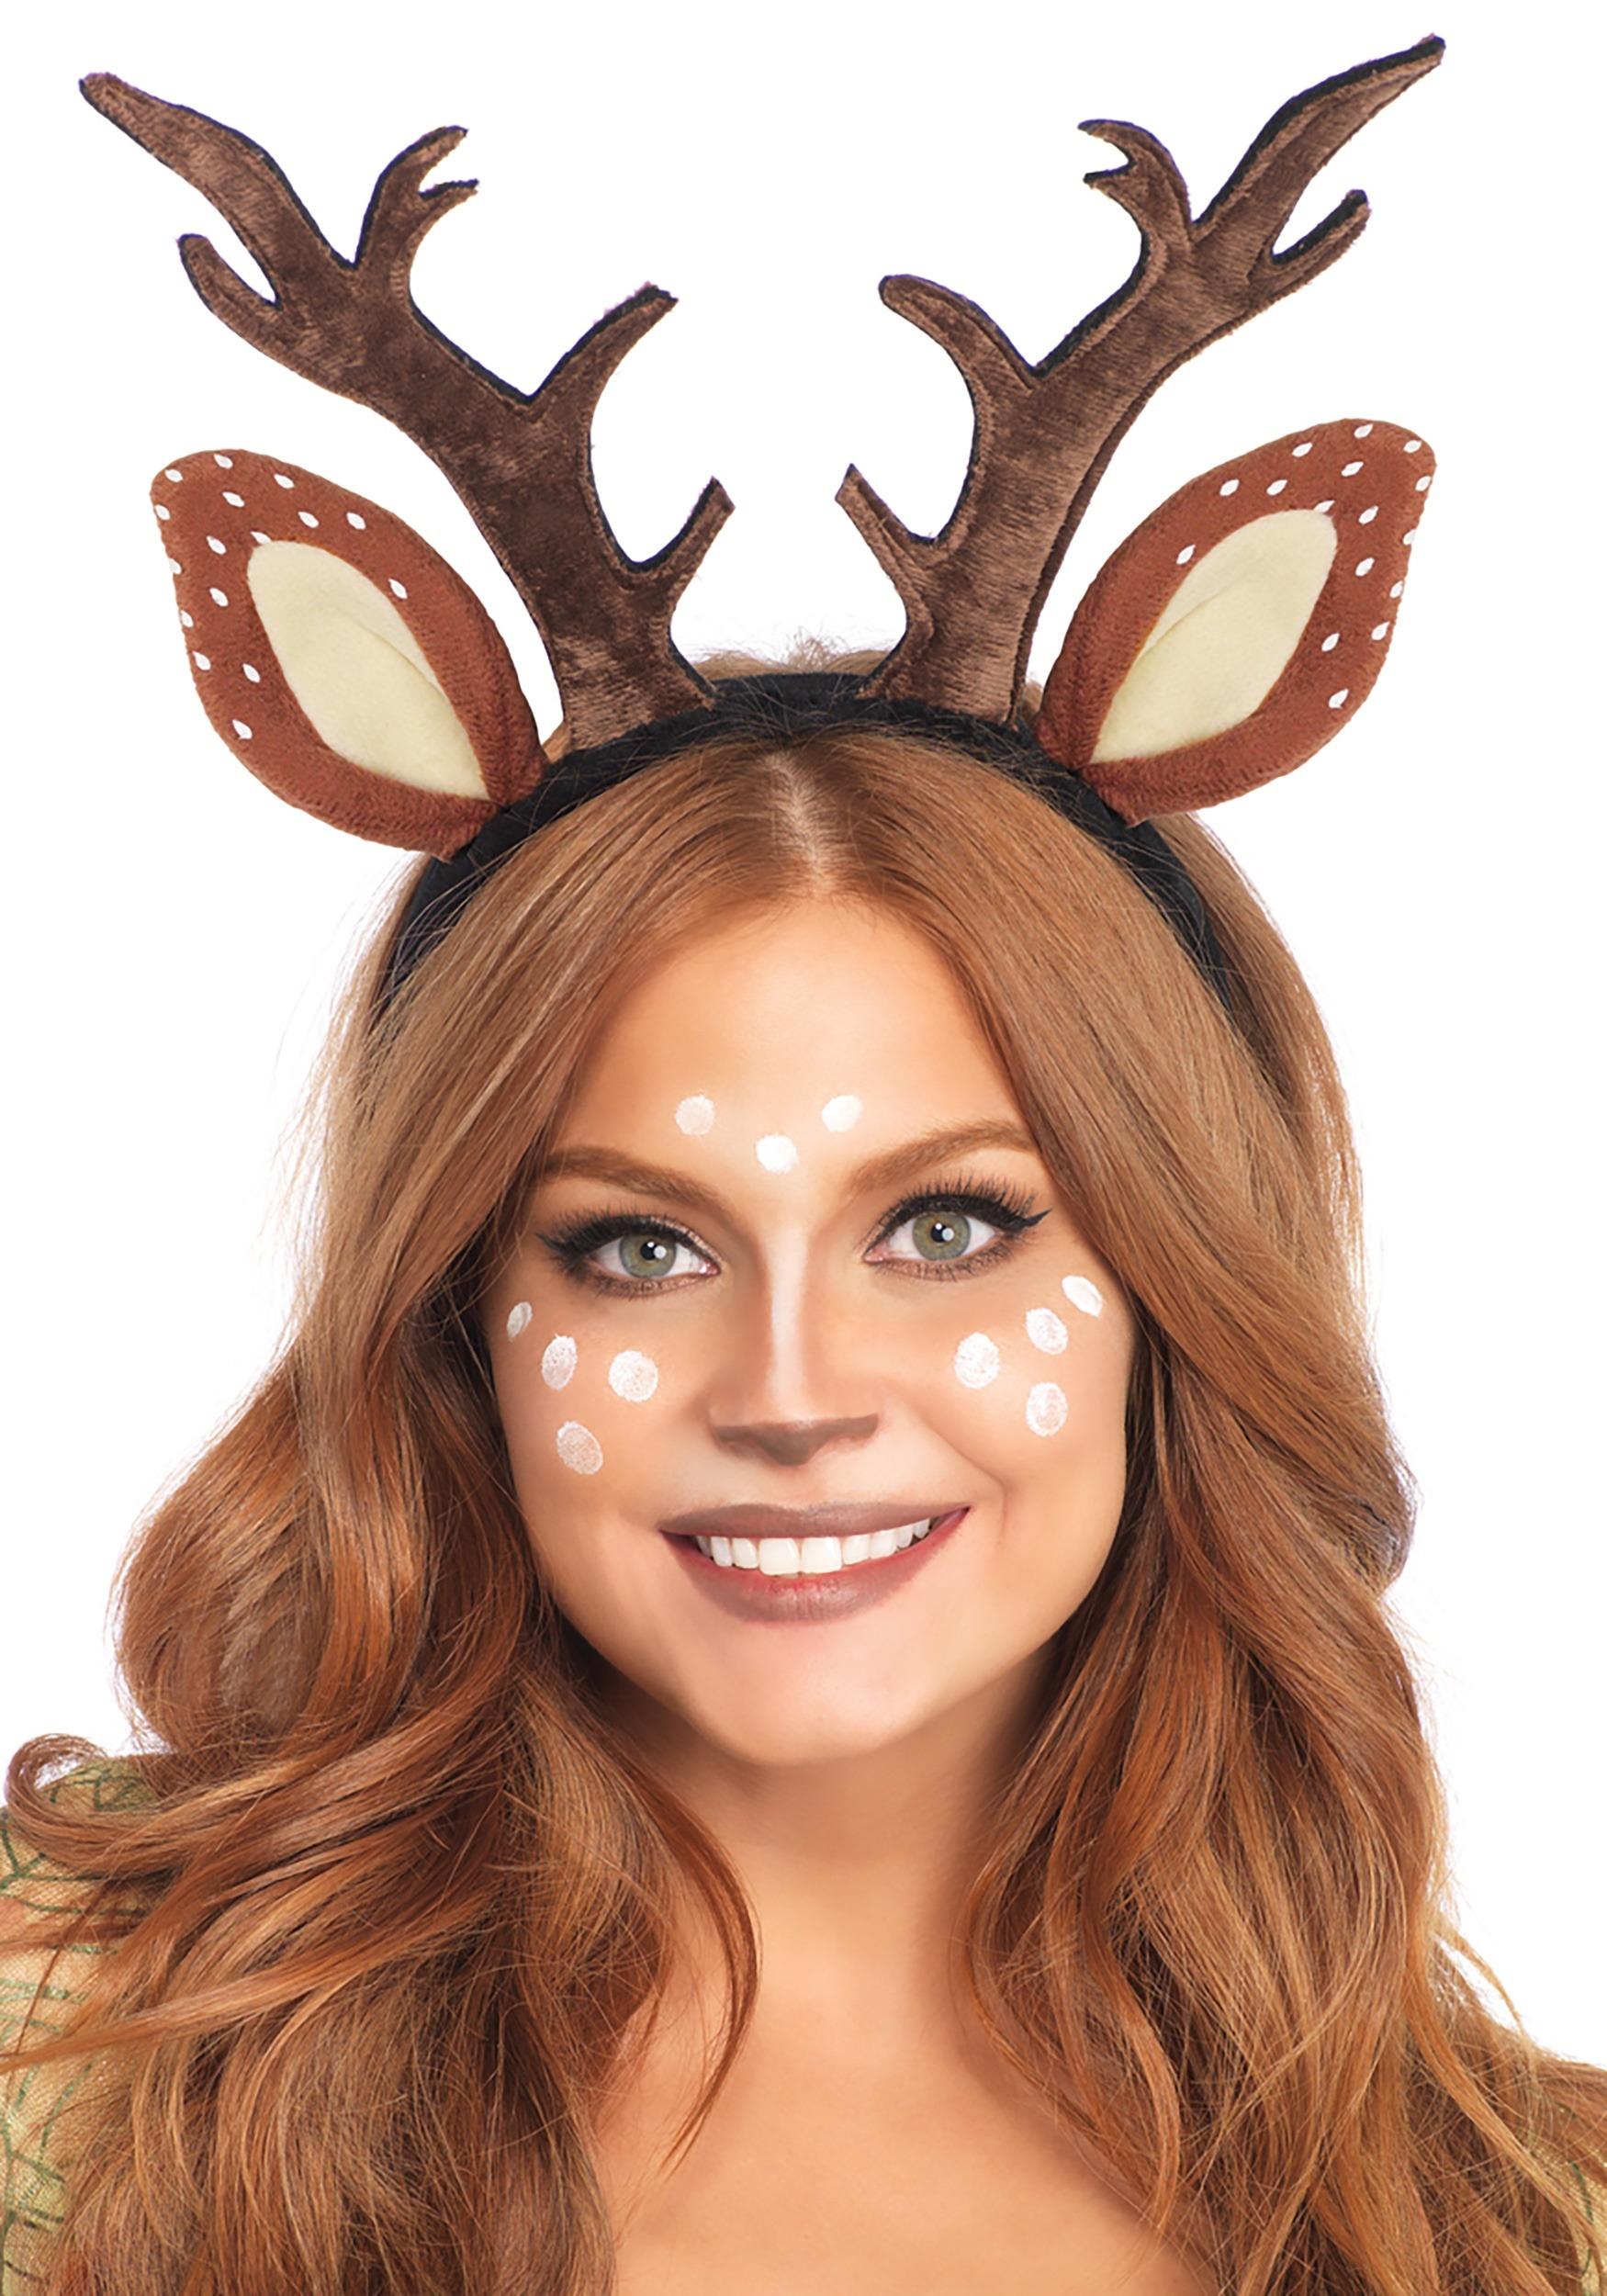 Christmas Brown Baby Reindeer Antlers and Ears Alice Hair Band Headband